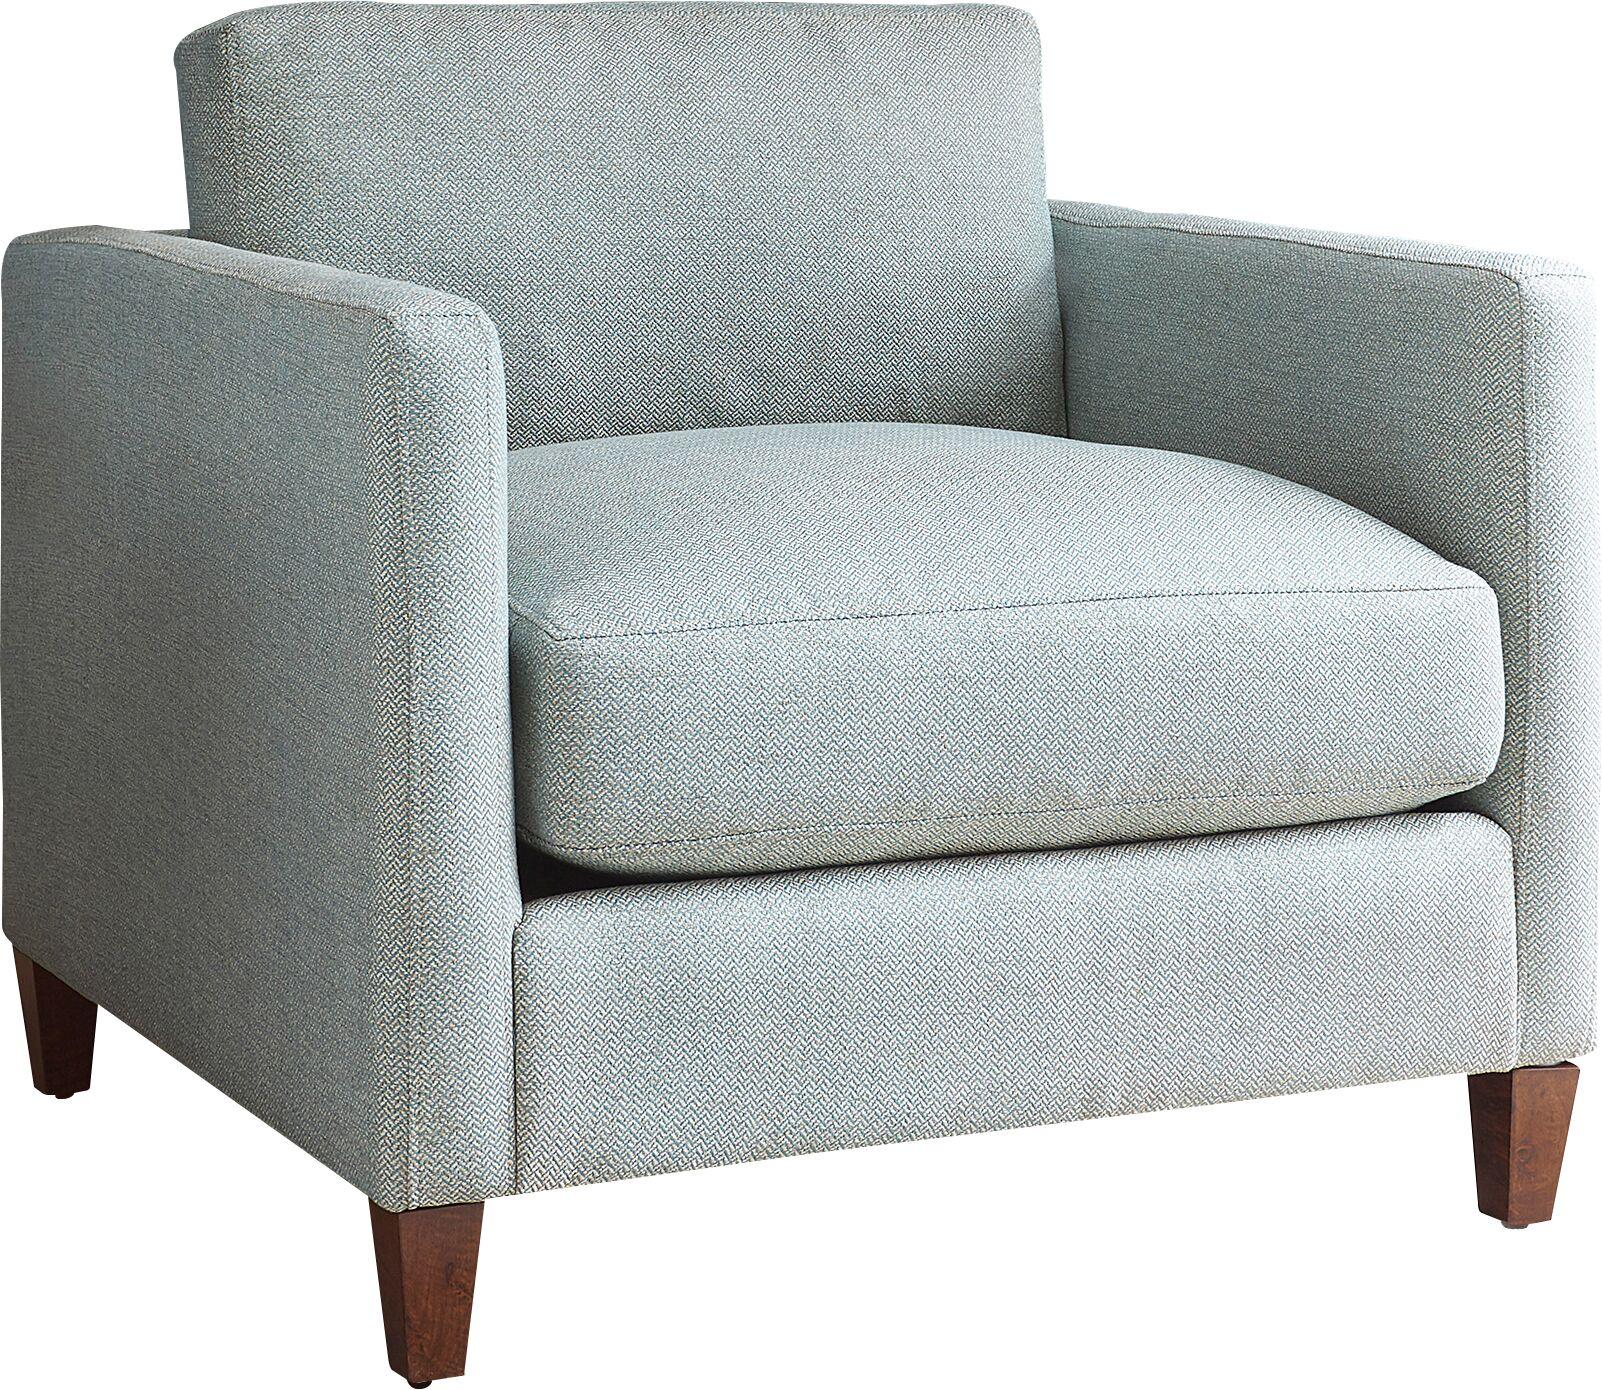 Colton Armchair Upholstery: Zula Oxblood